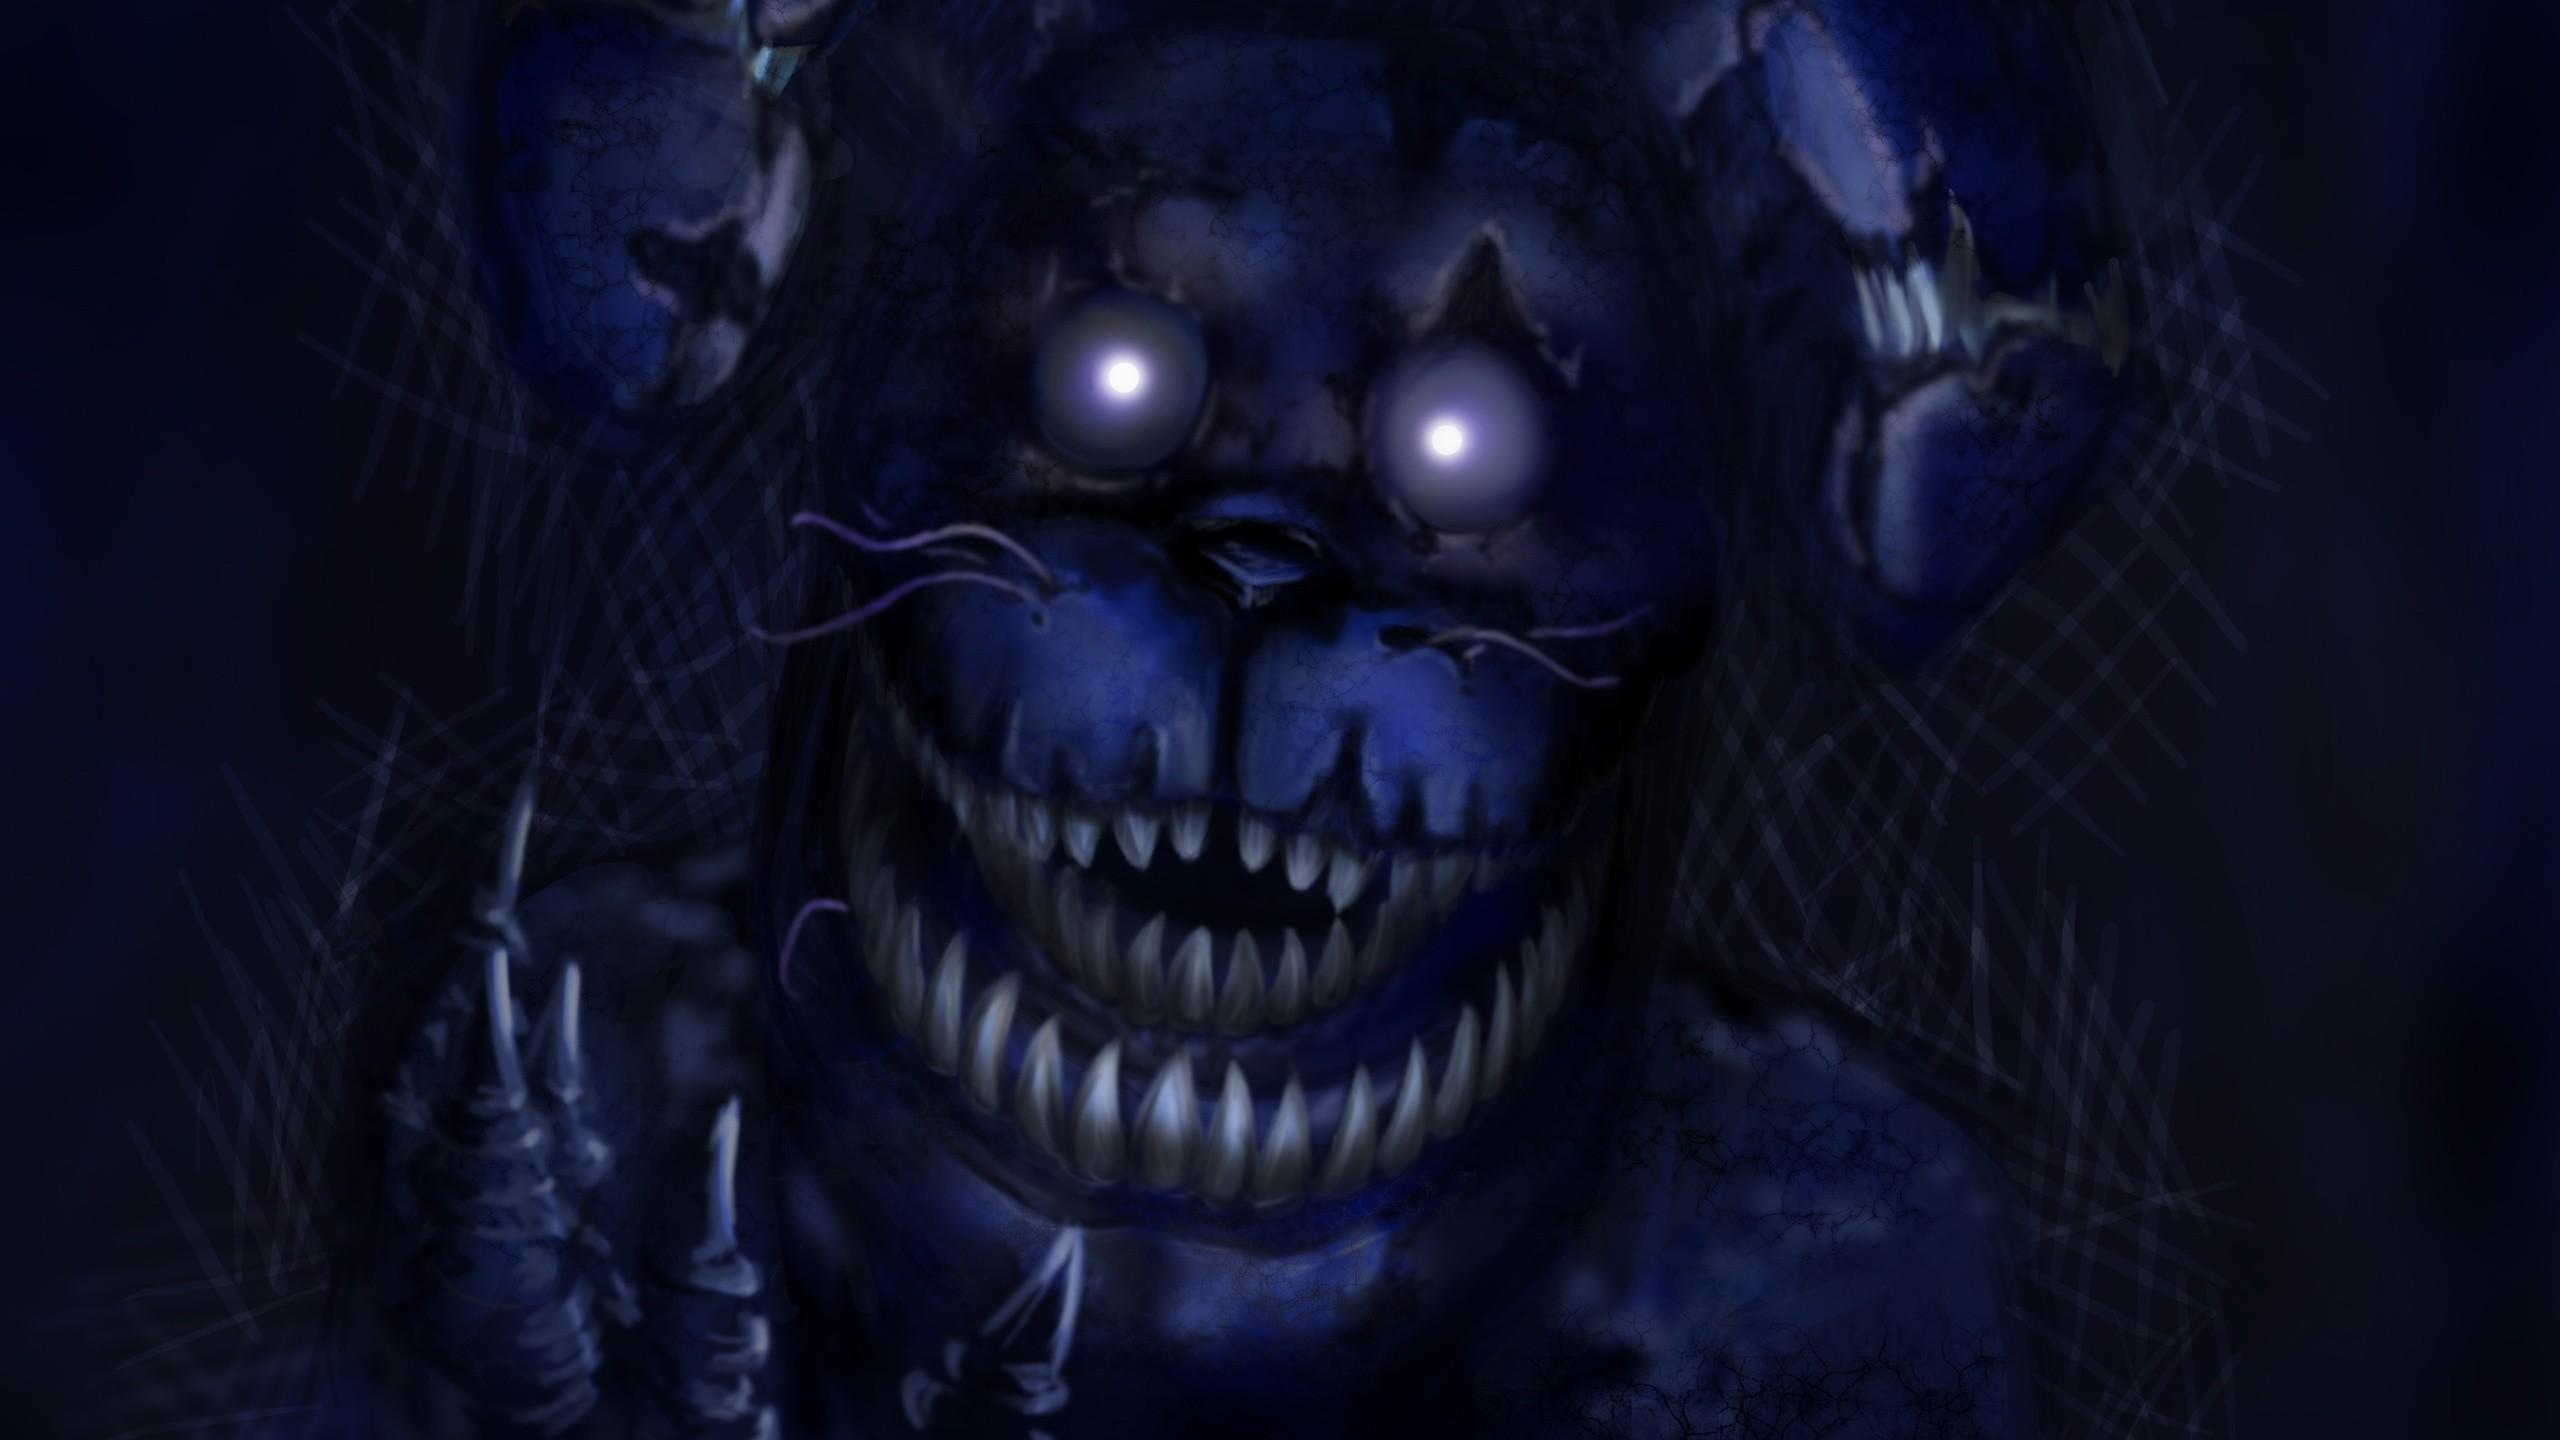 Fnaf, Fnaf 4, Nightmare, Horror Game, Bonnie .